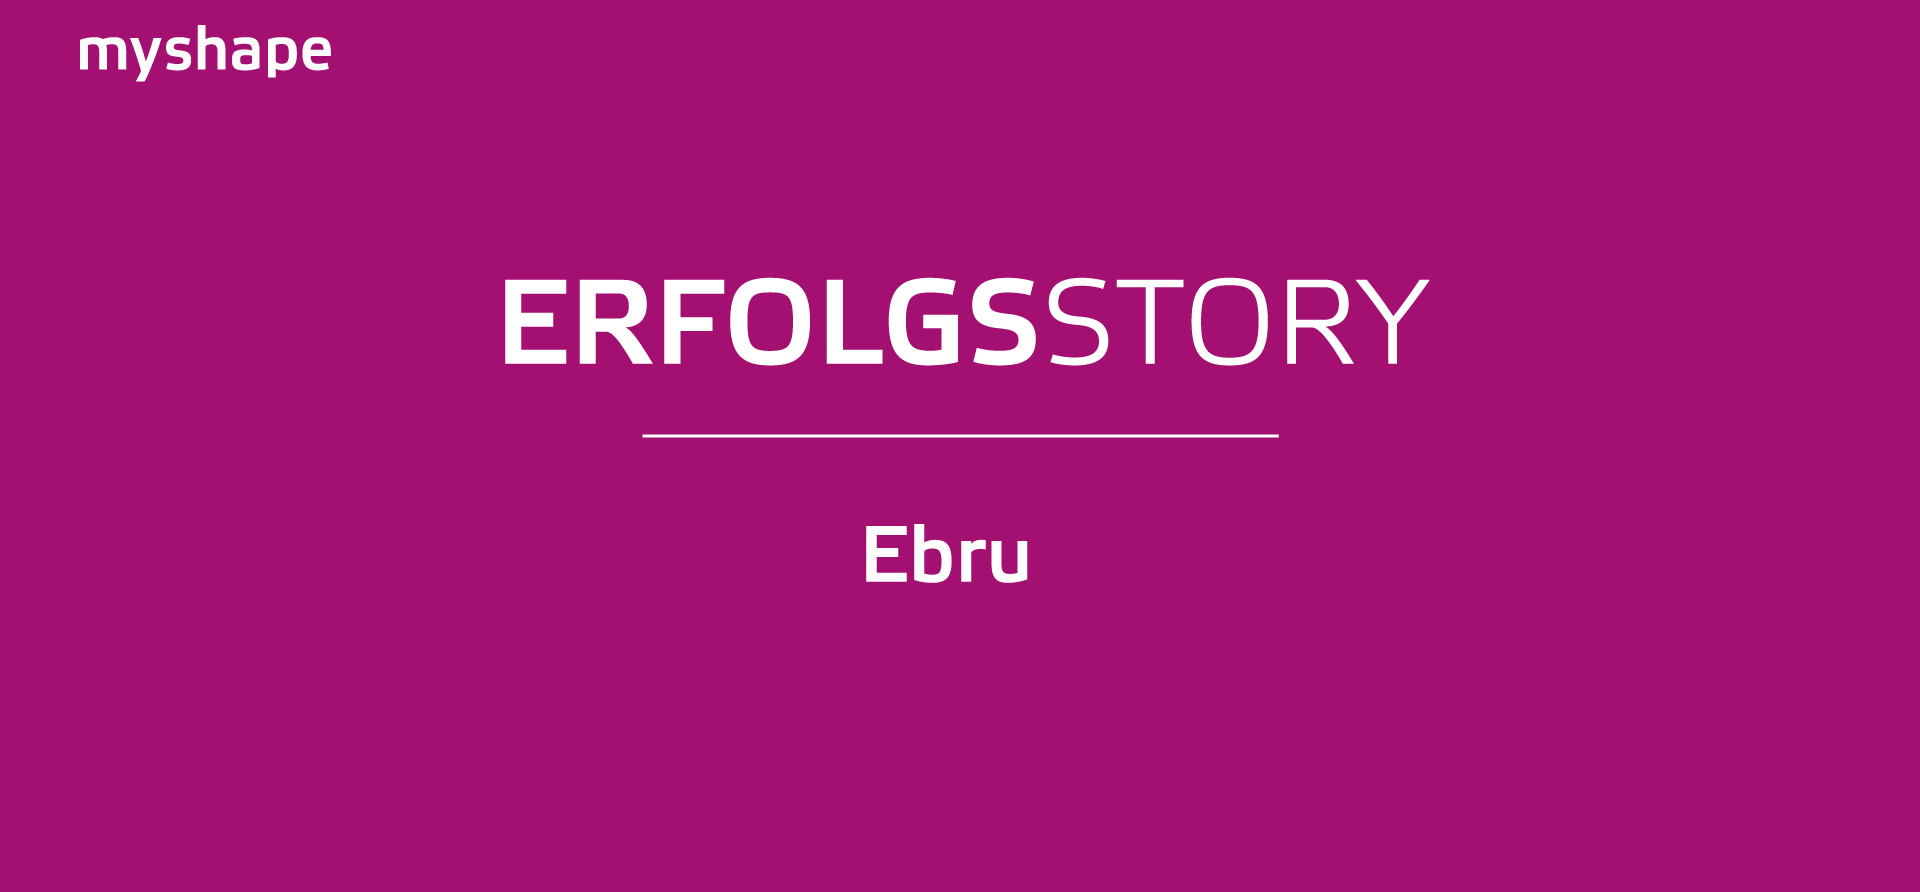 Ebrus Erfolgsstory